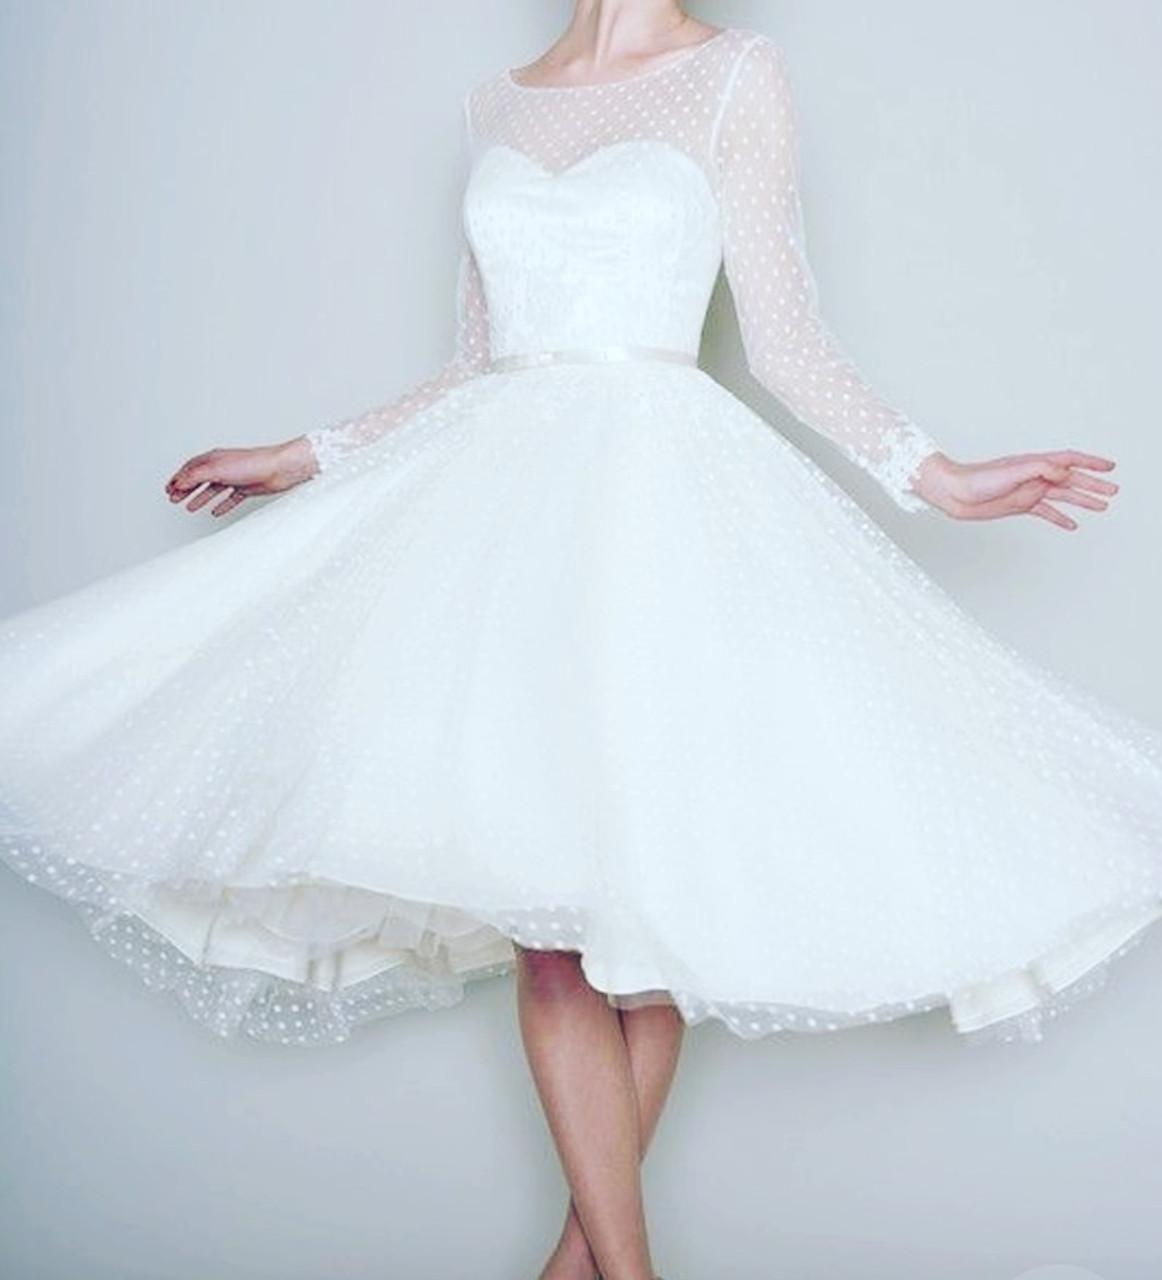 1231553fc ... 1905's Vintage White Long Sleeve Short Wedding Dress Women Bridal  Dresses Tea Length Retro Dotted Wedding ...